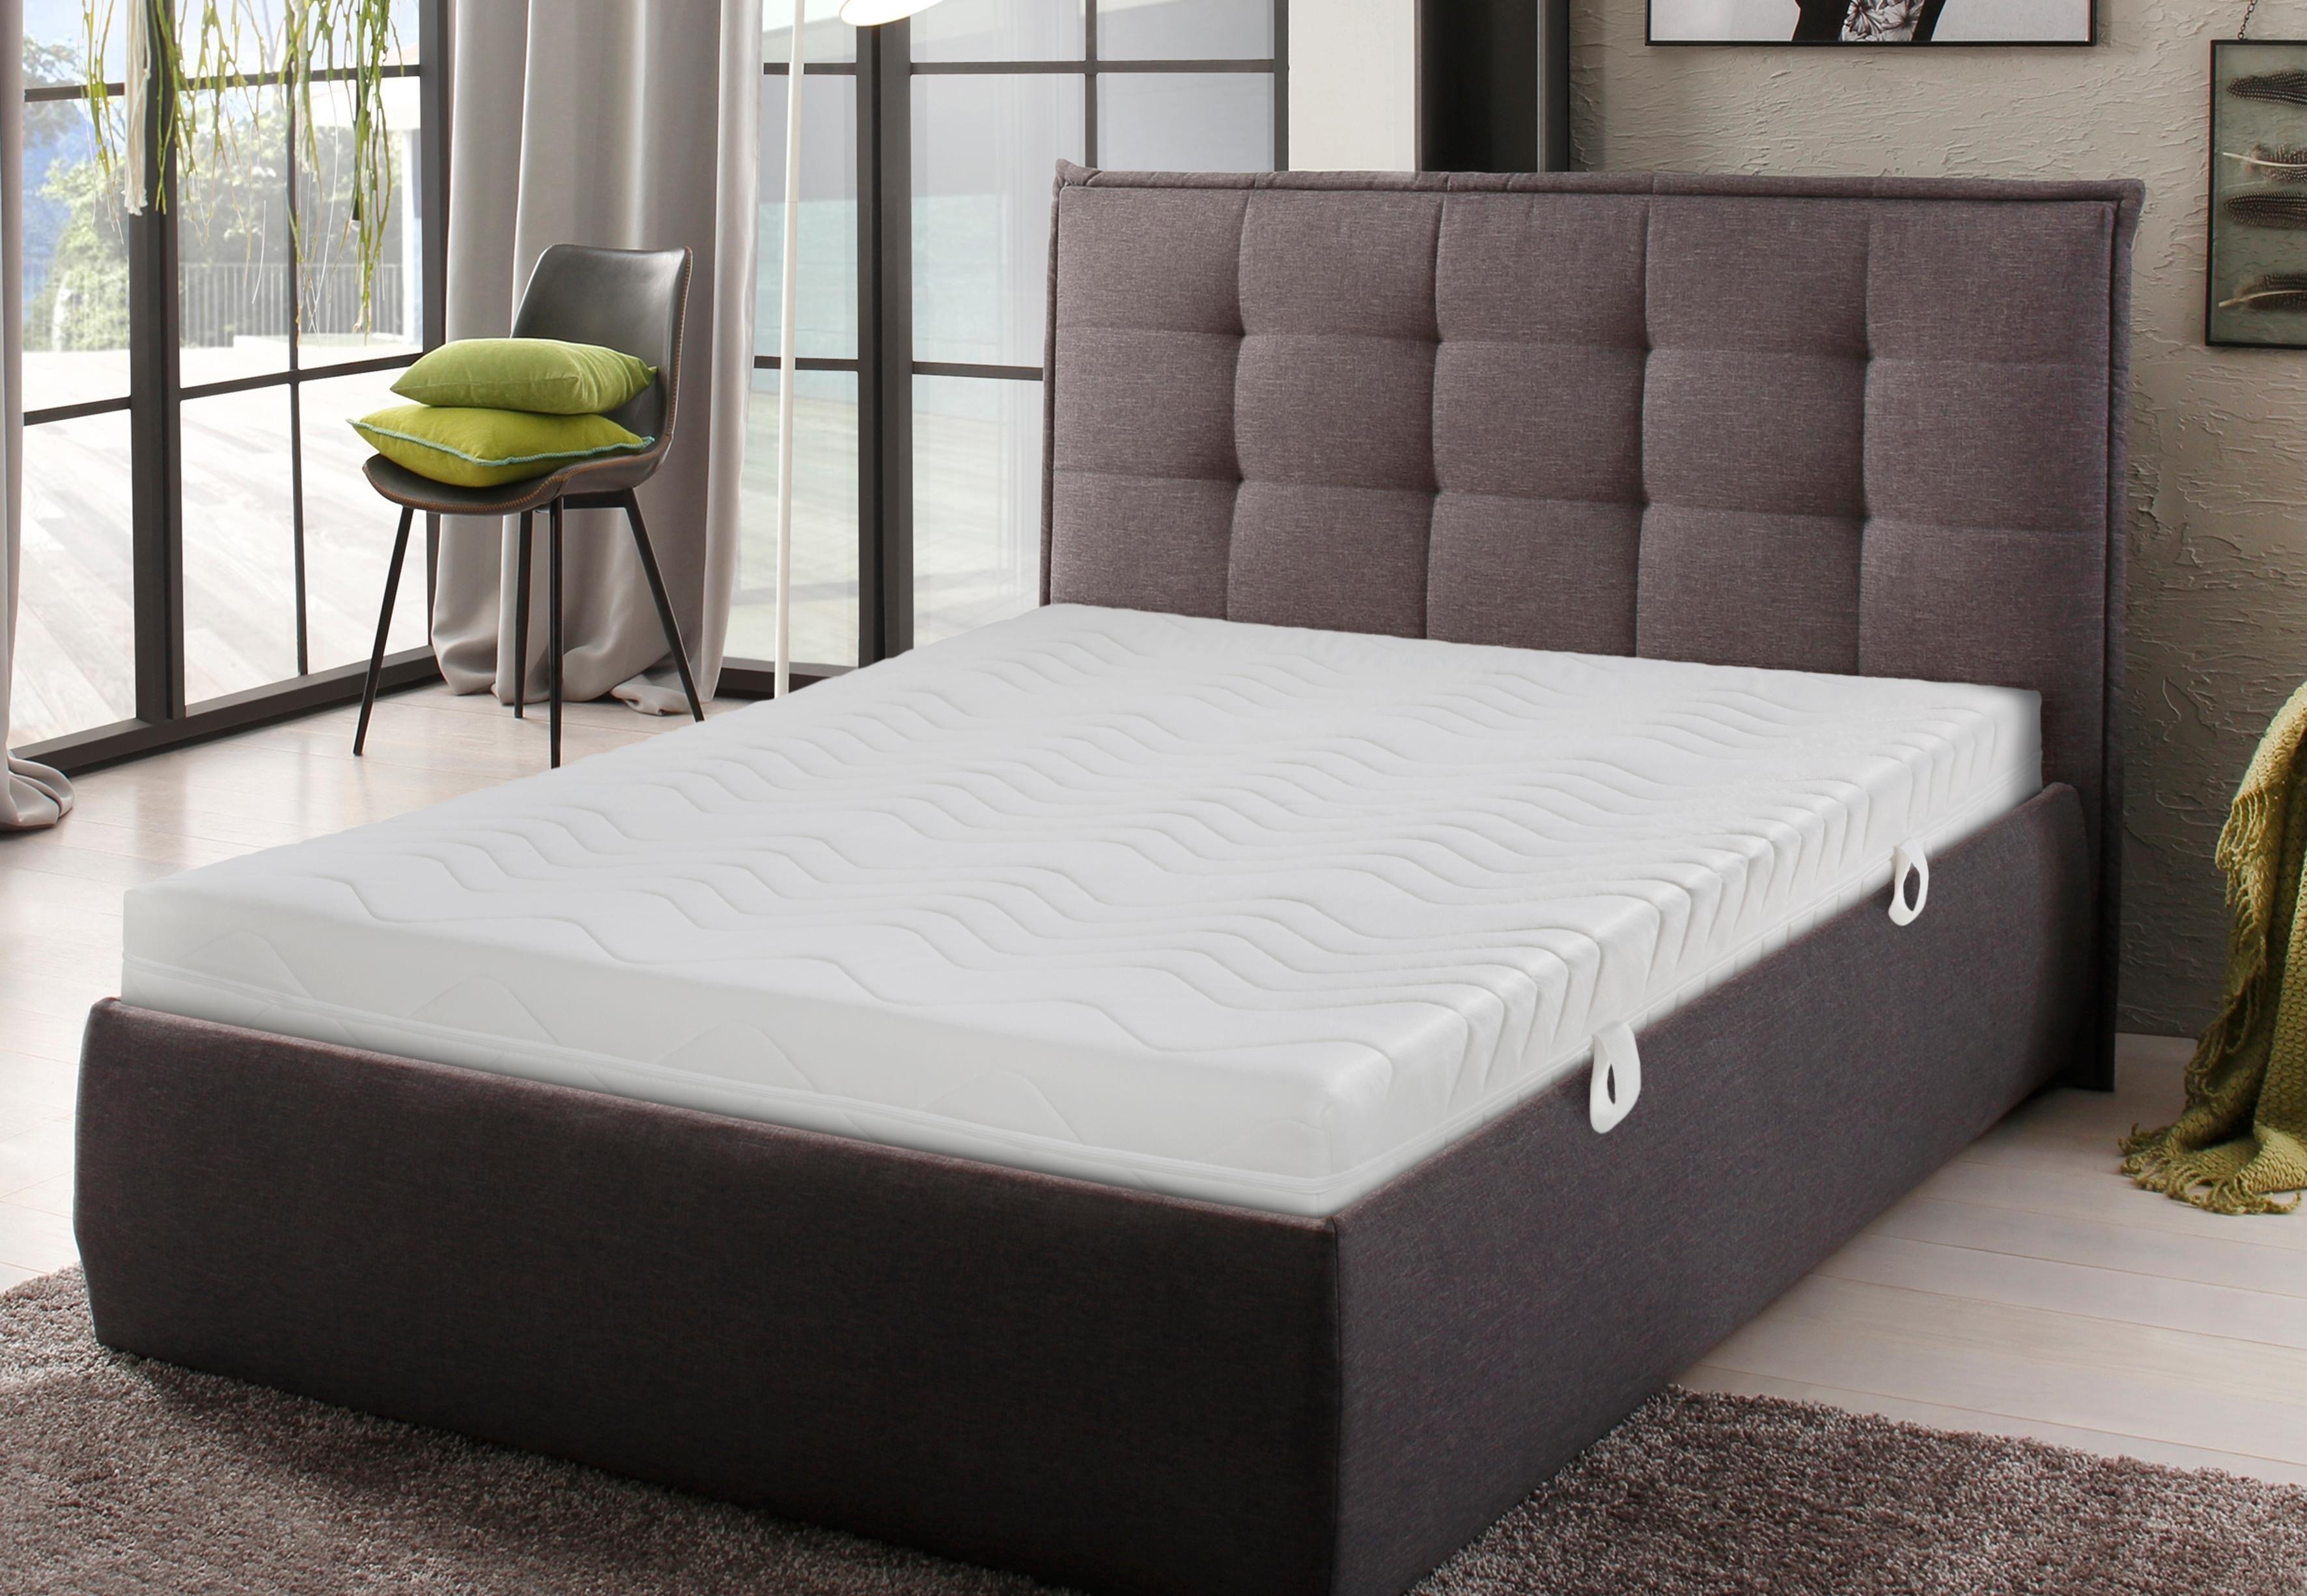 My Home Comfortschuimmatras »Übergrößen«, 20 cm dik, dichtheid: 30 bij OTTO online kopen